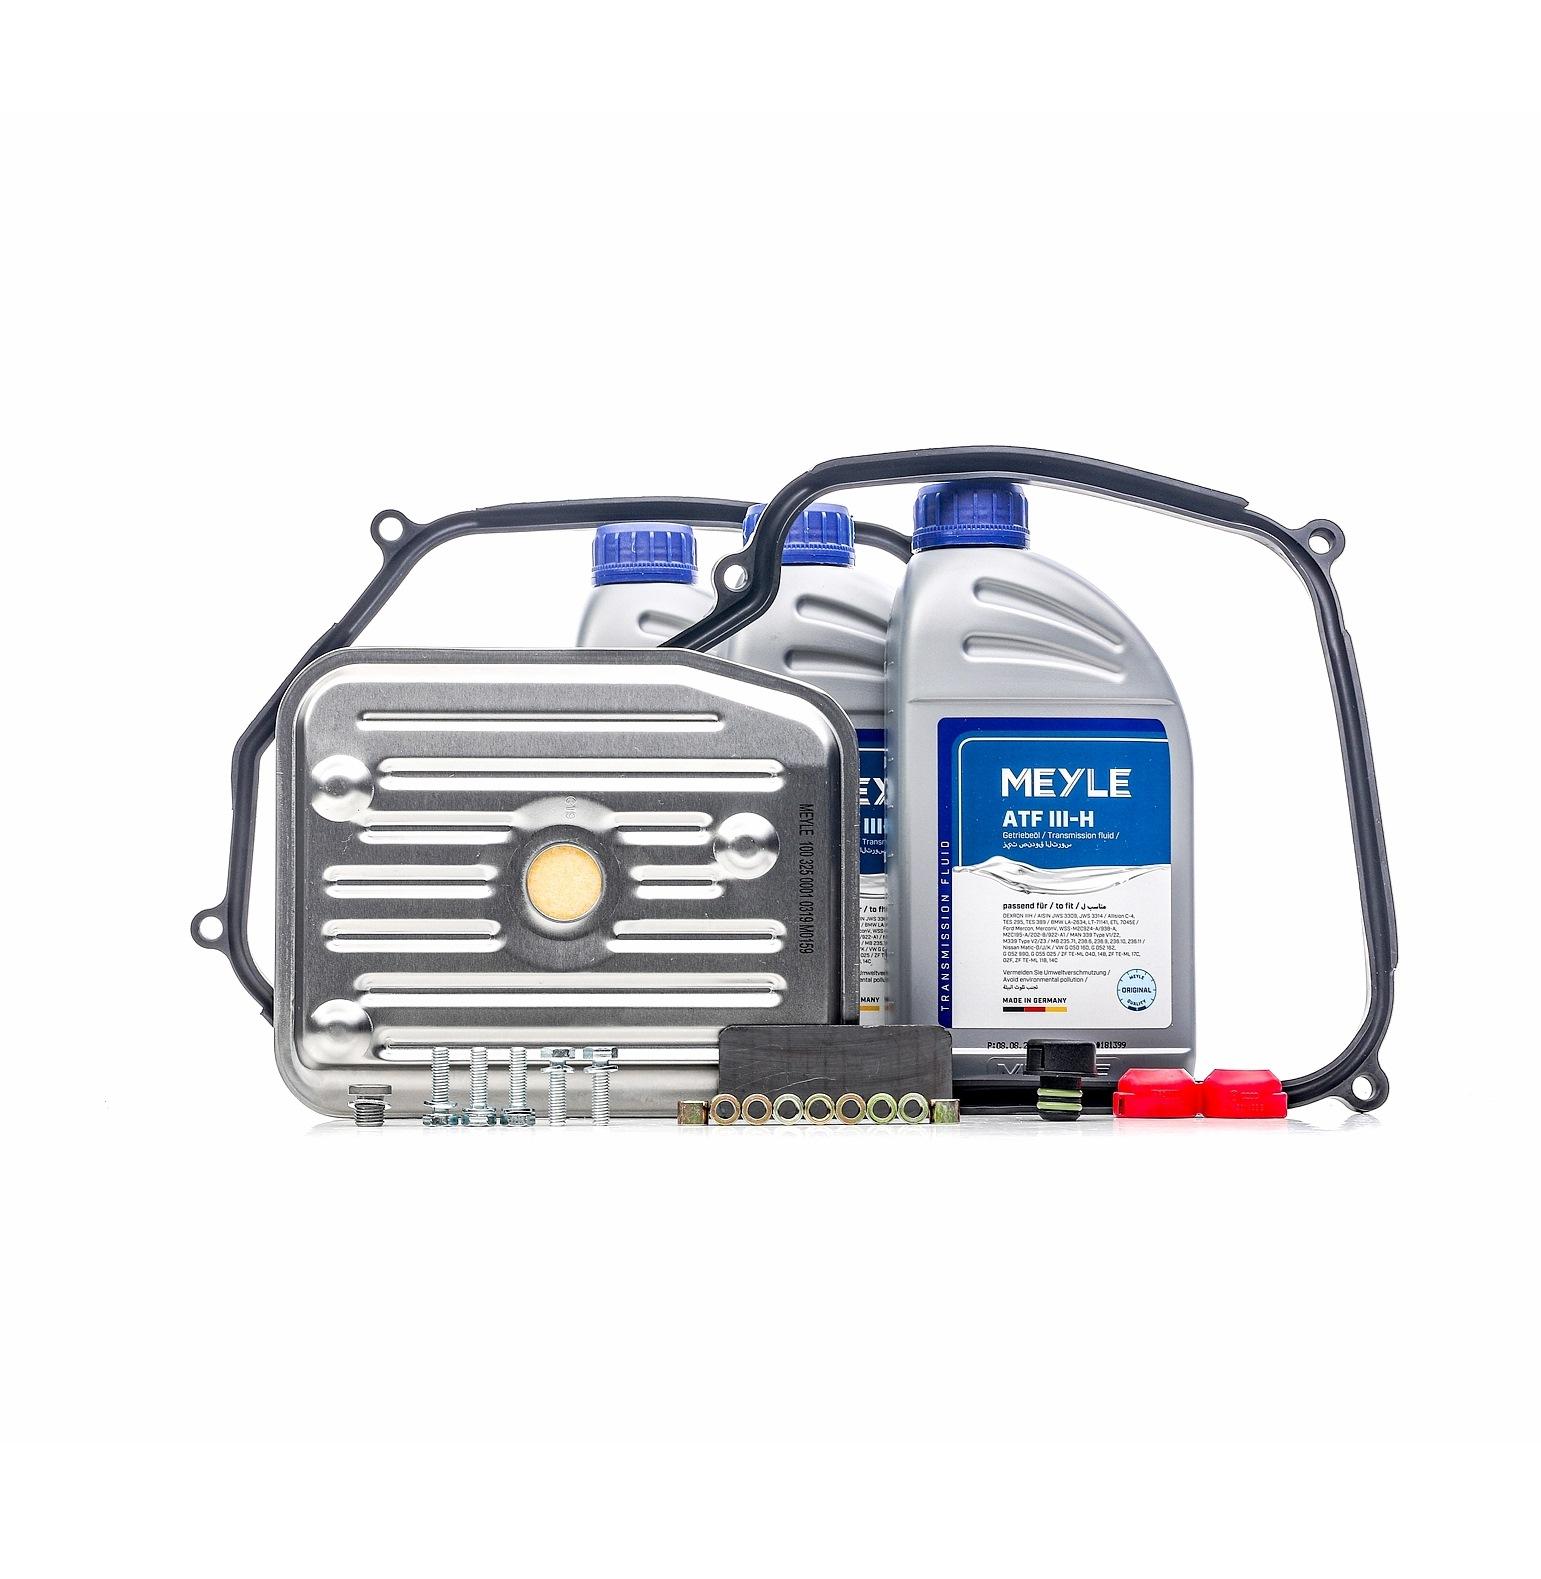 MEYLE: Original Teilesatz, Ölwechsel-Automatikgetriebe 100 135 0014 ()